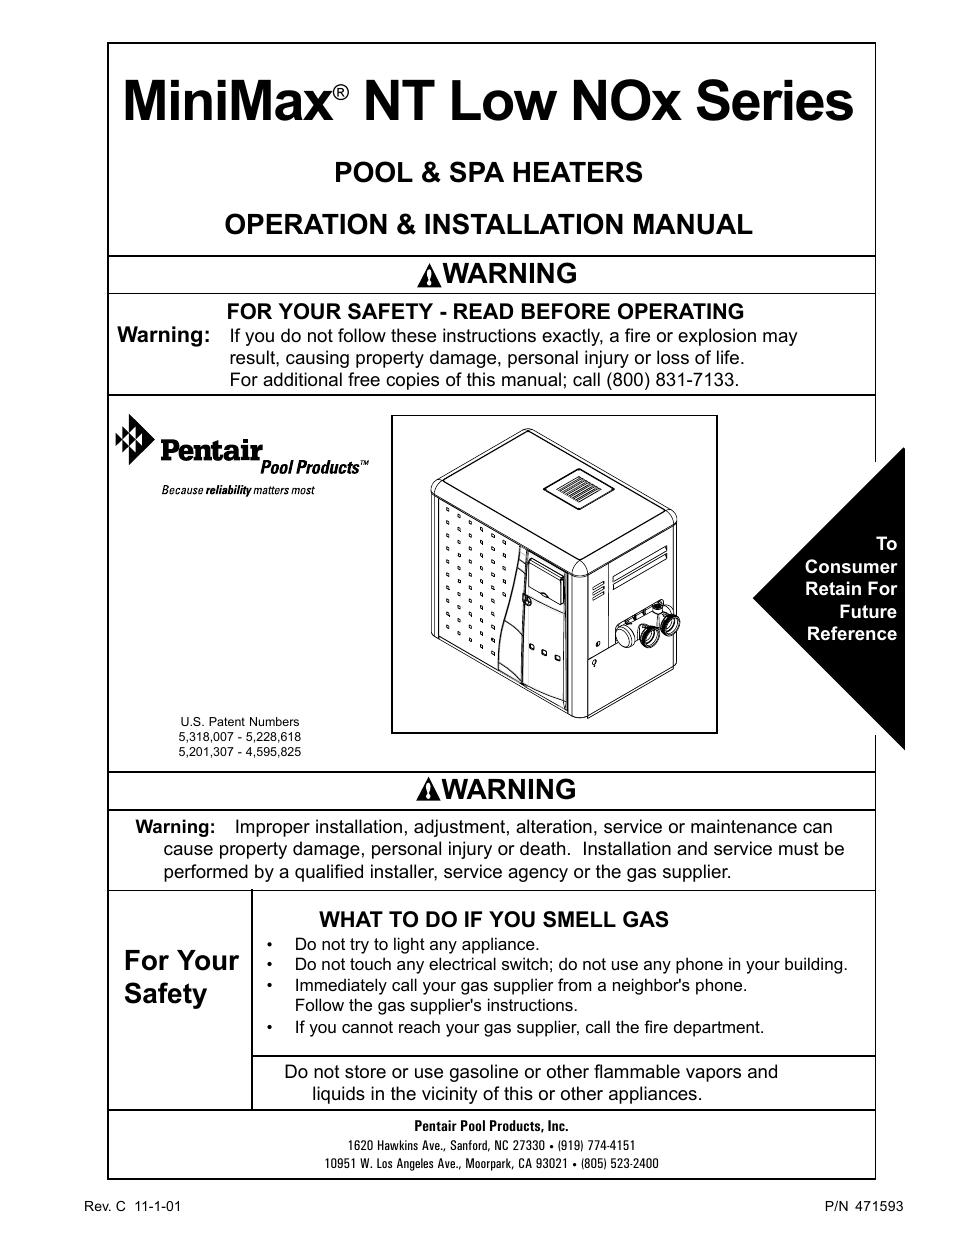 pentair minimax 250 user manual 40 pages also for purex triton rh manualsdir com pentair minimax nt pool heater troubleshooting pentair minimax nt heater troubleshooting